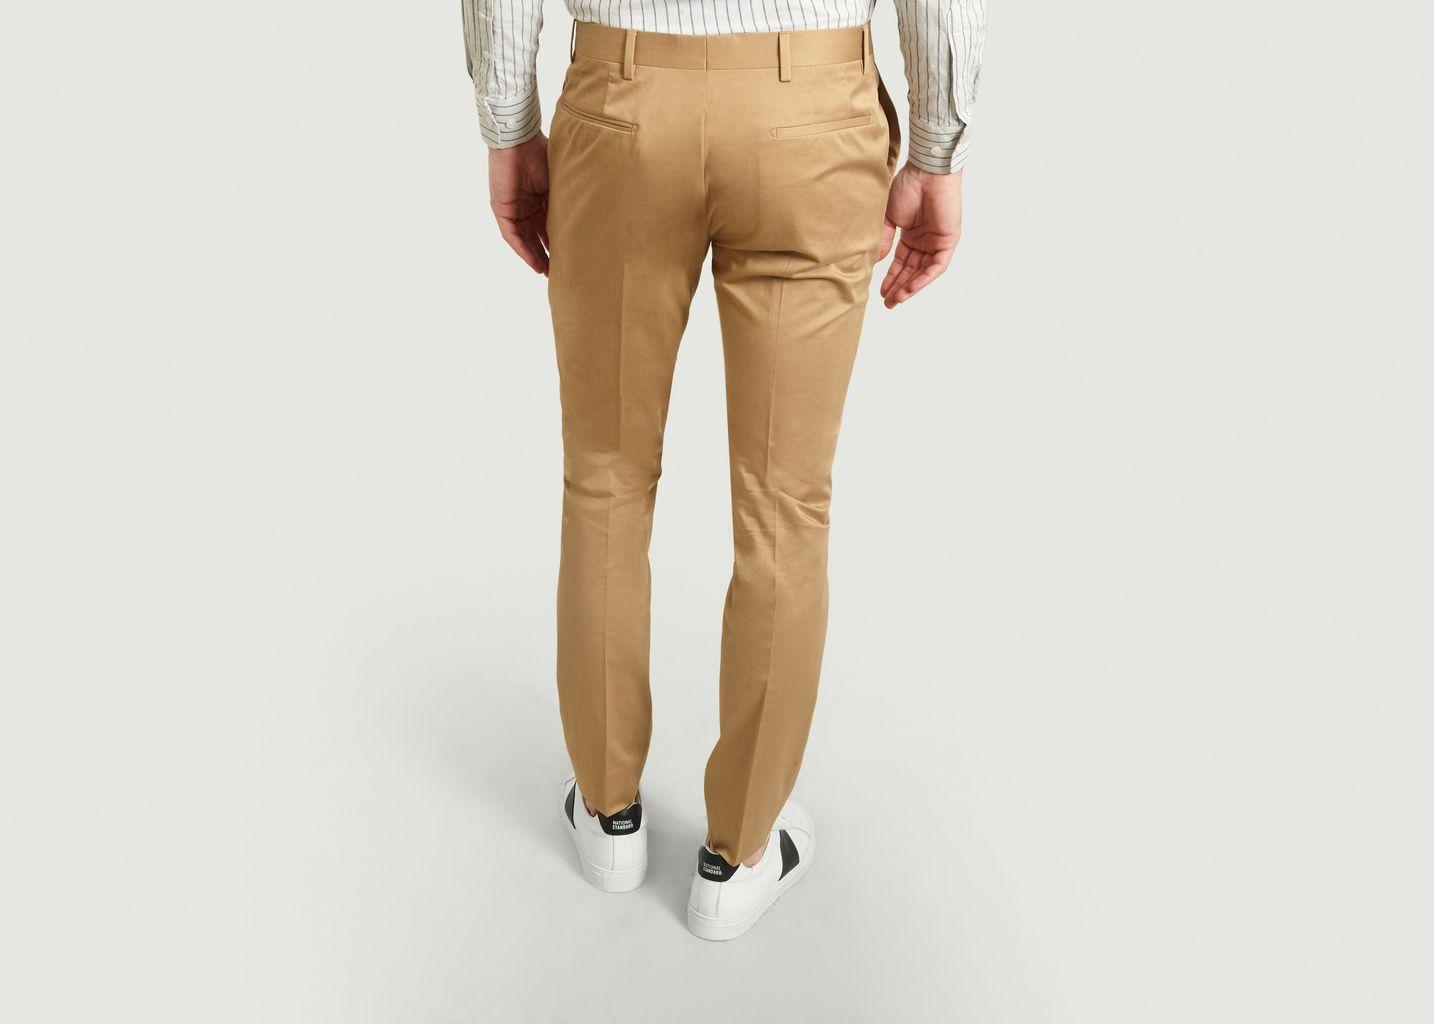 Pantalon Costume - PS by PAUL SMITH